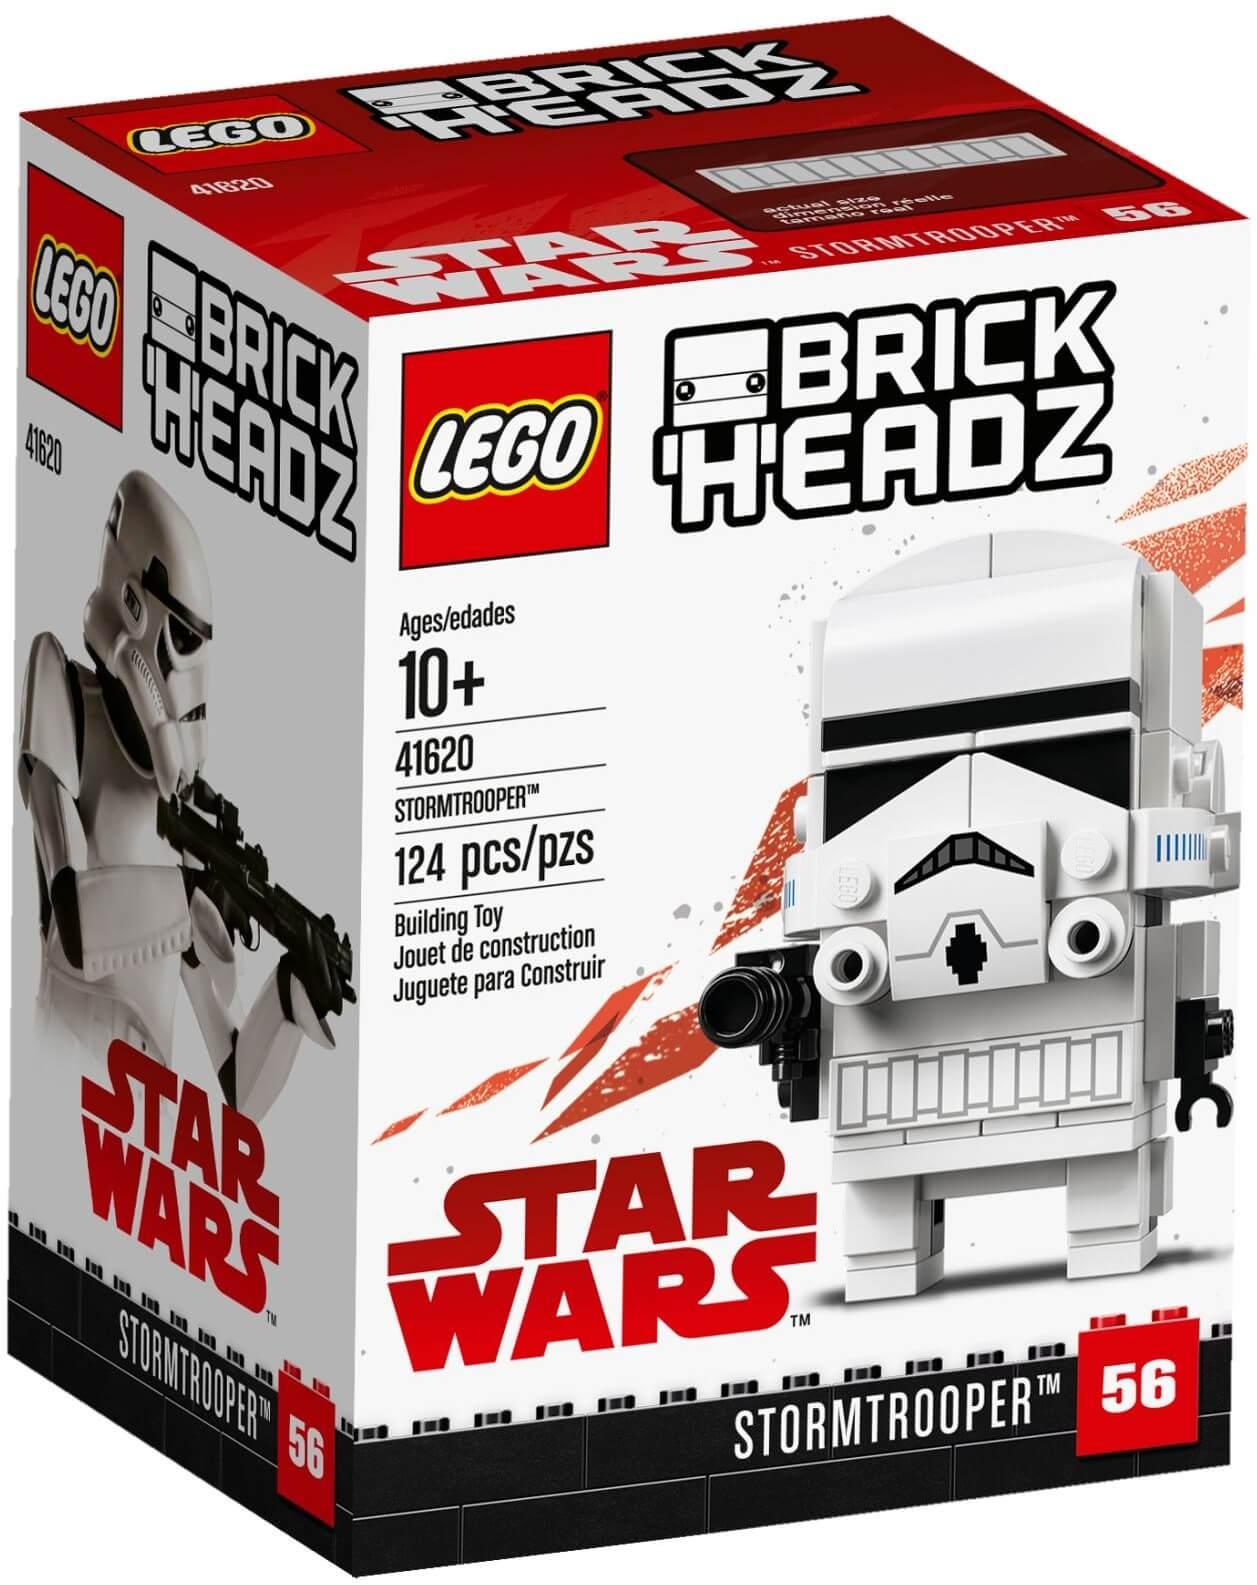 Mua đồ chơi LEGO 41620 - LEGO Brickheadz Star Wars 41620 - Mô hình Chibi Star Wars - Stormtrooper (LEGO Brickheadz Star Wars 41620 Stormtrooper)